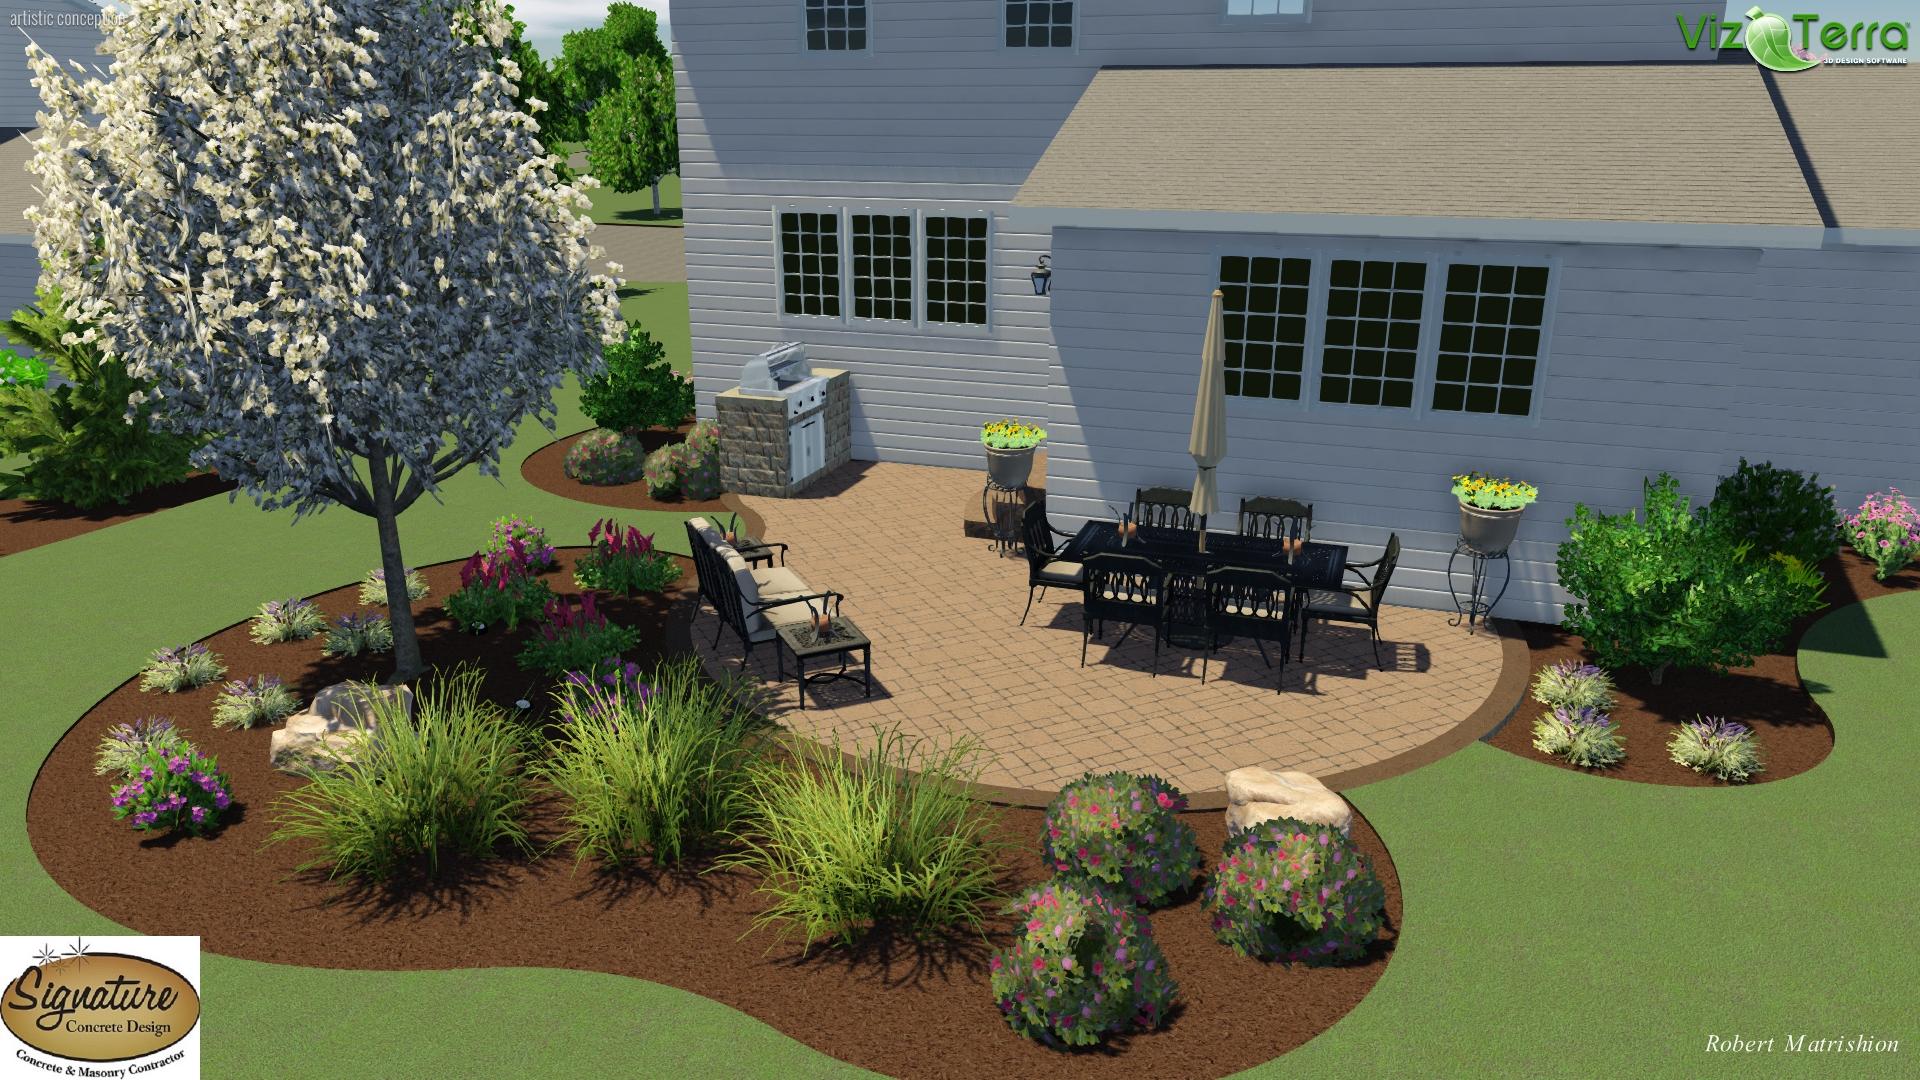 Signature Landscape Design Customized Paver Patio With Landscaping